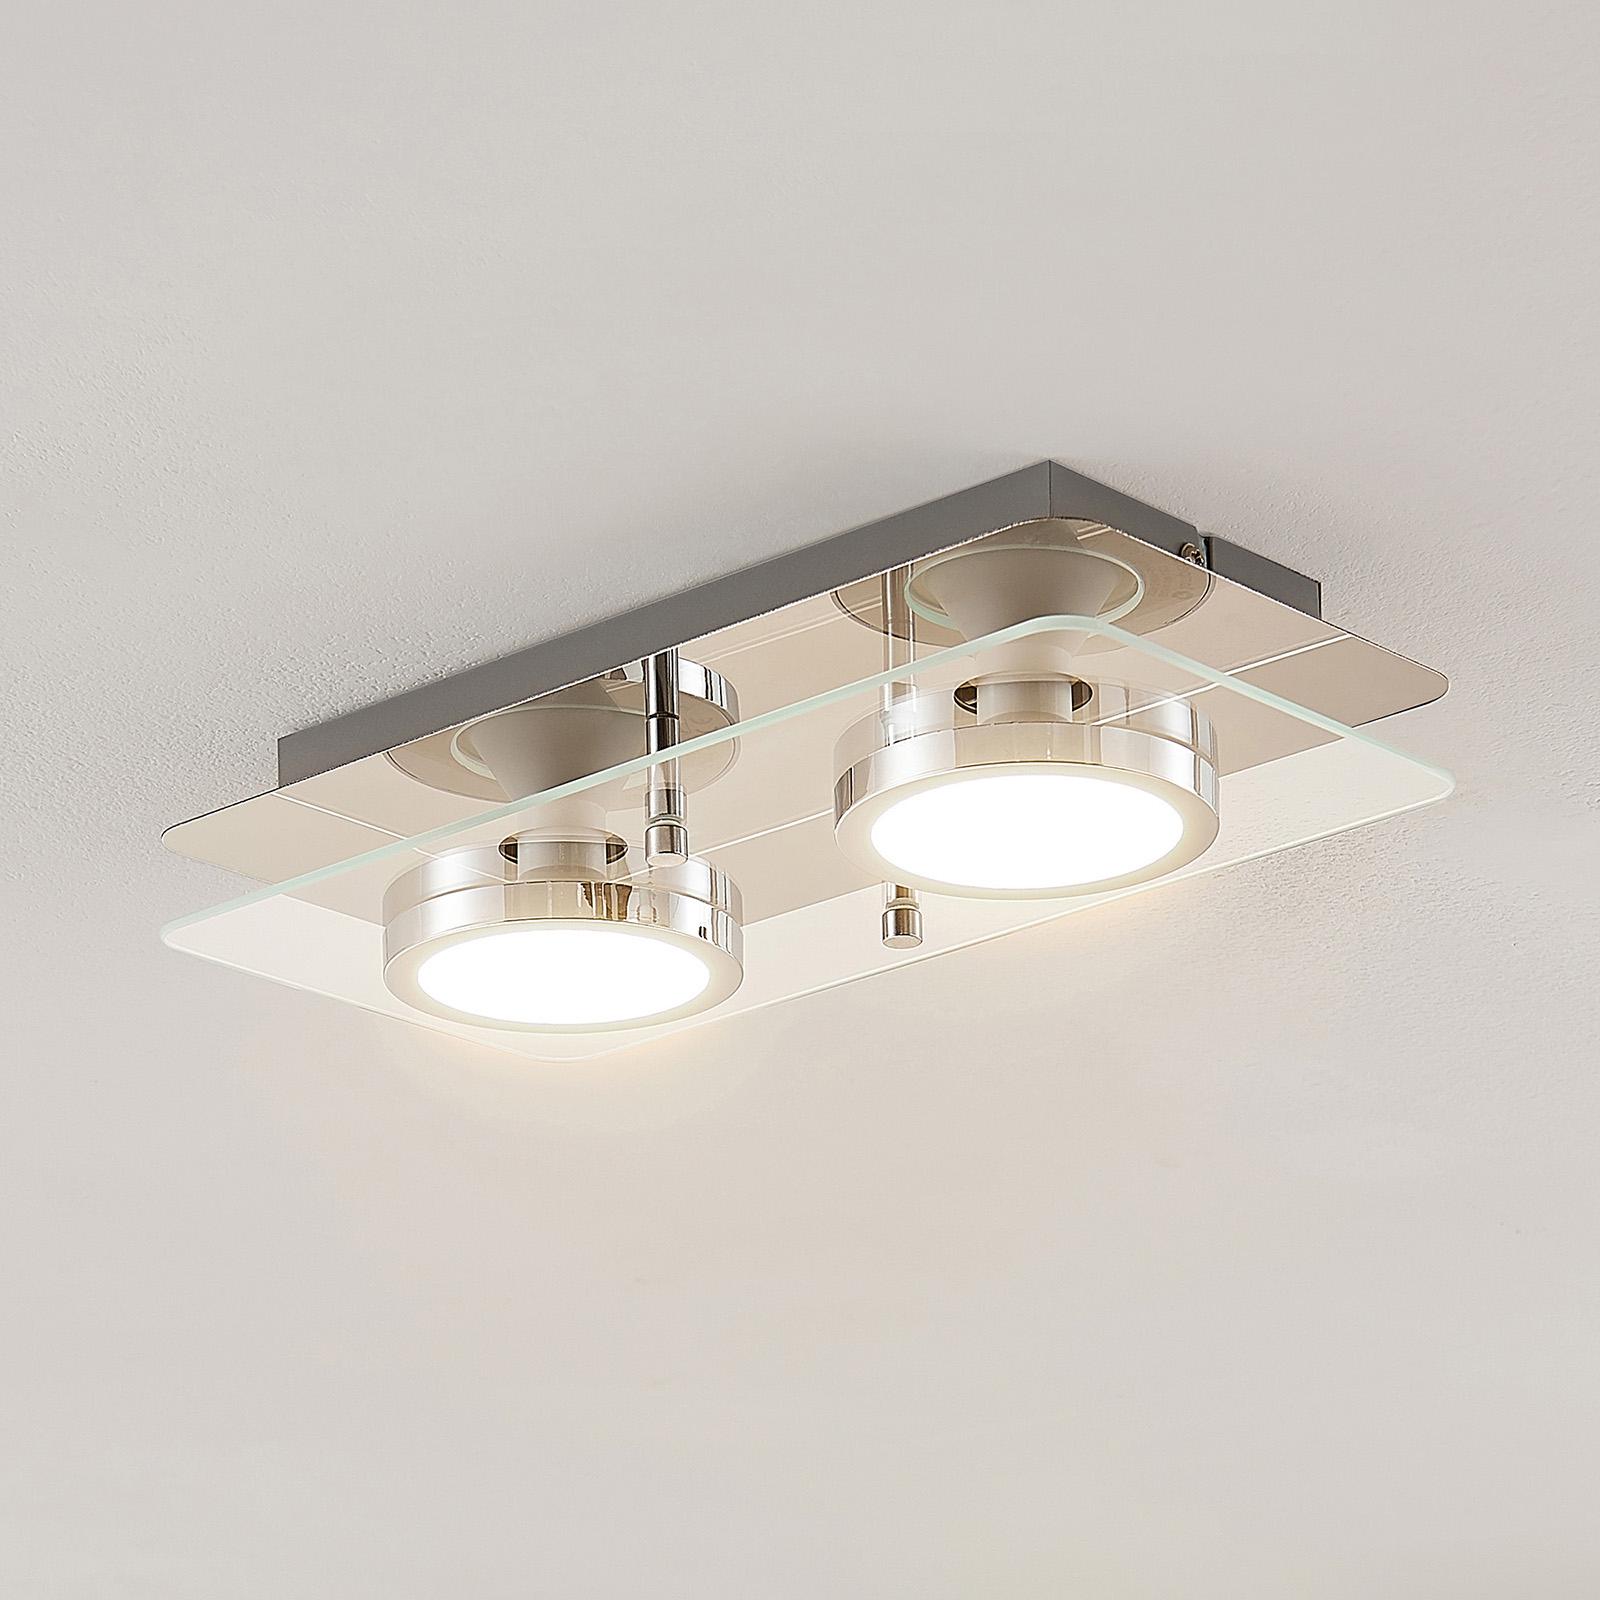 Lindby Gabryl LED-kattovalaisin, kaksilamppuinen